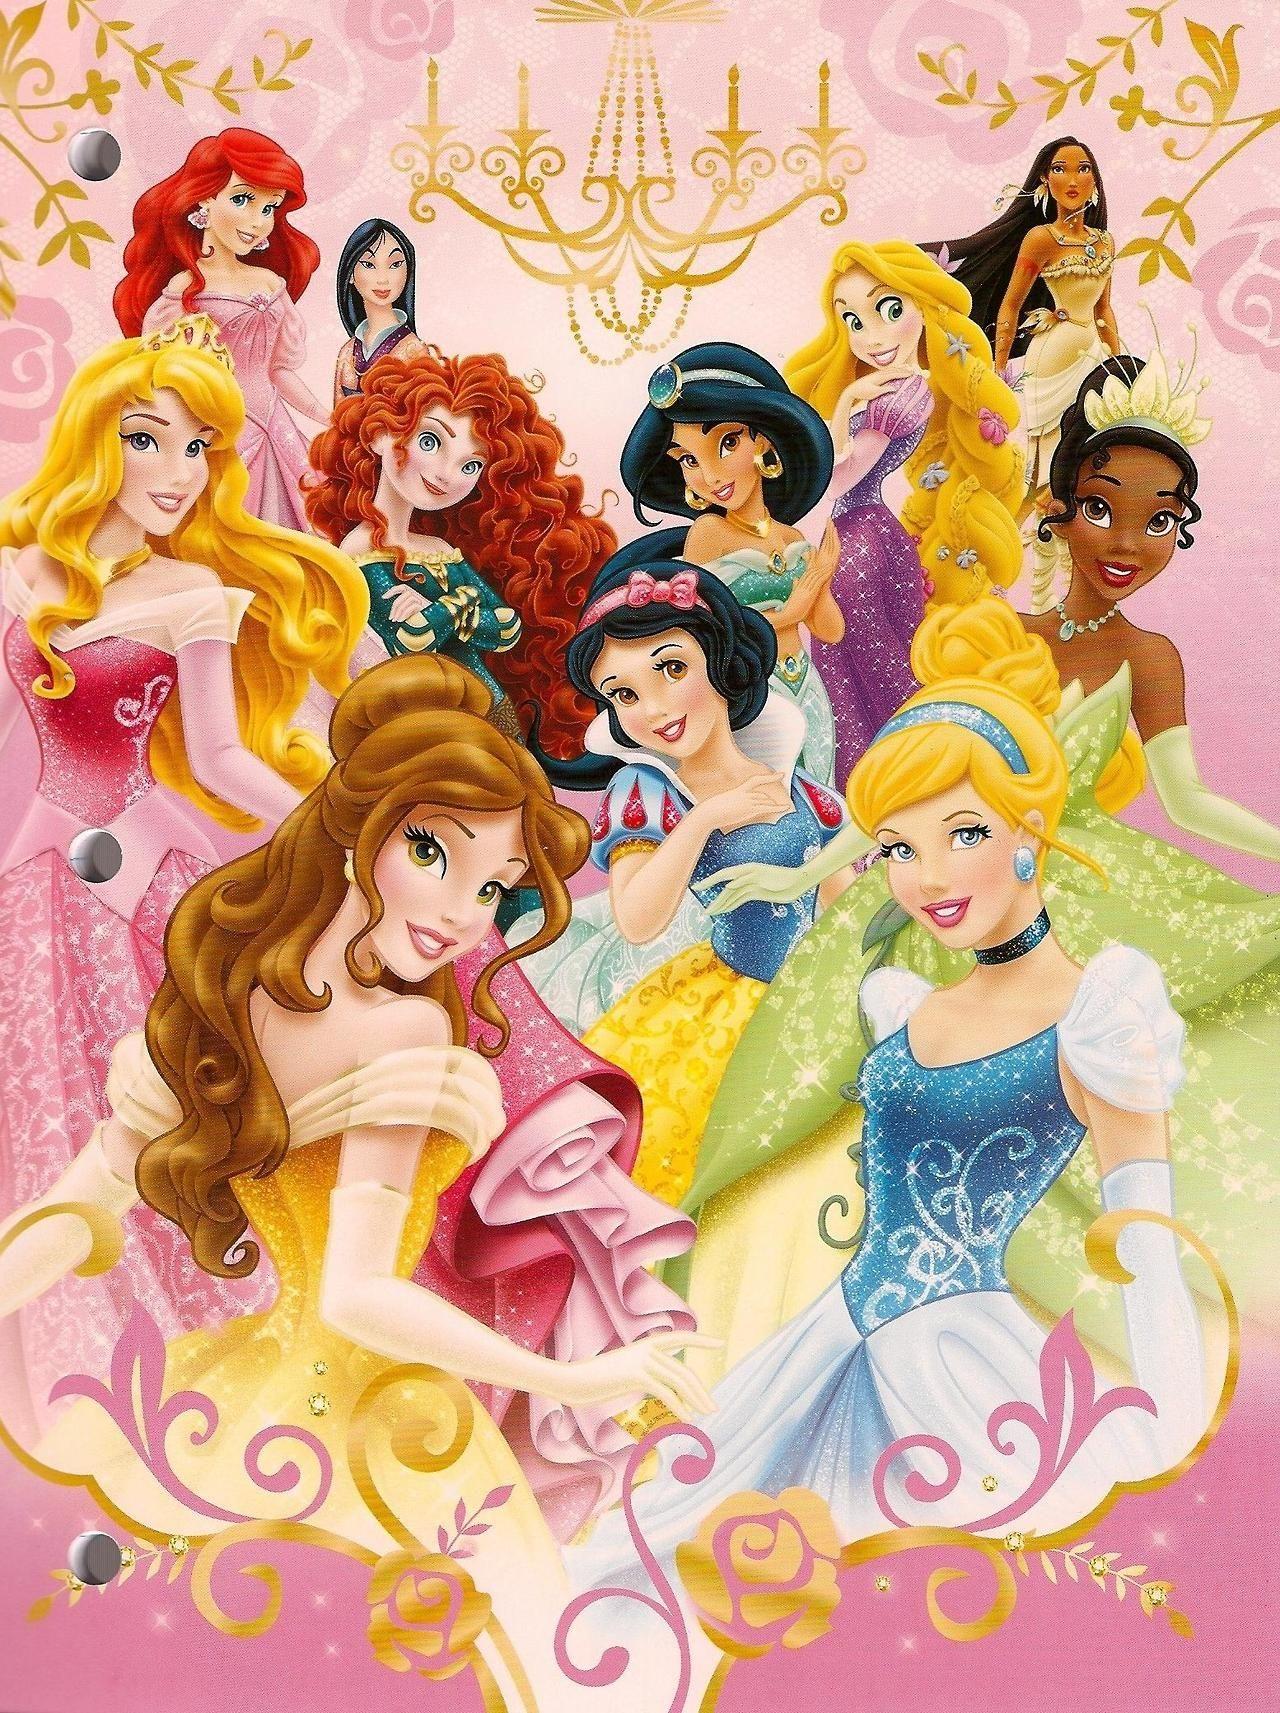 Disney Princess Hd Wallpaper Free Jpg 1280 1713 Disney Princess Pictures All Disney Princesses Disney Princess Art